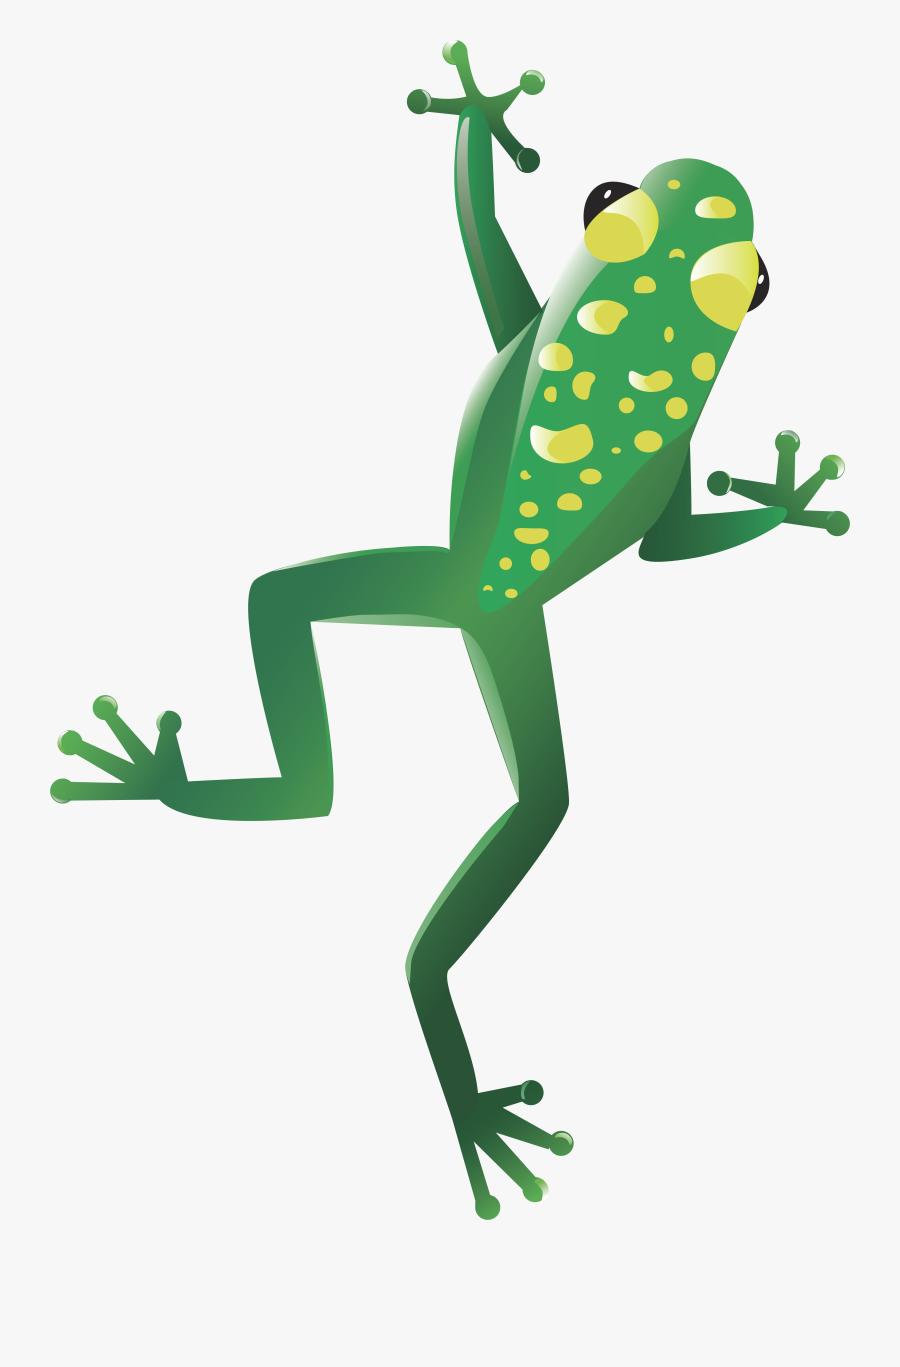 Transparent Green Frog Png - Transparent Background Cute Tree Frog Clipart, Transparent Clipart